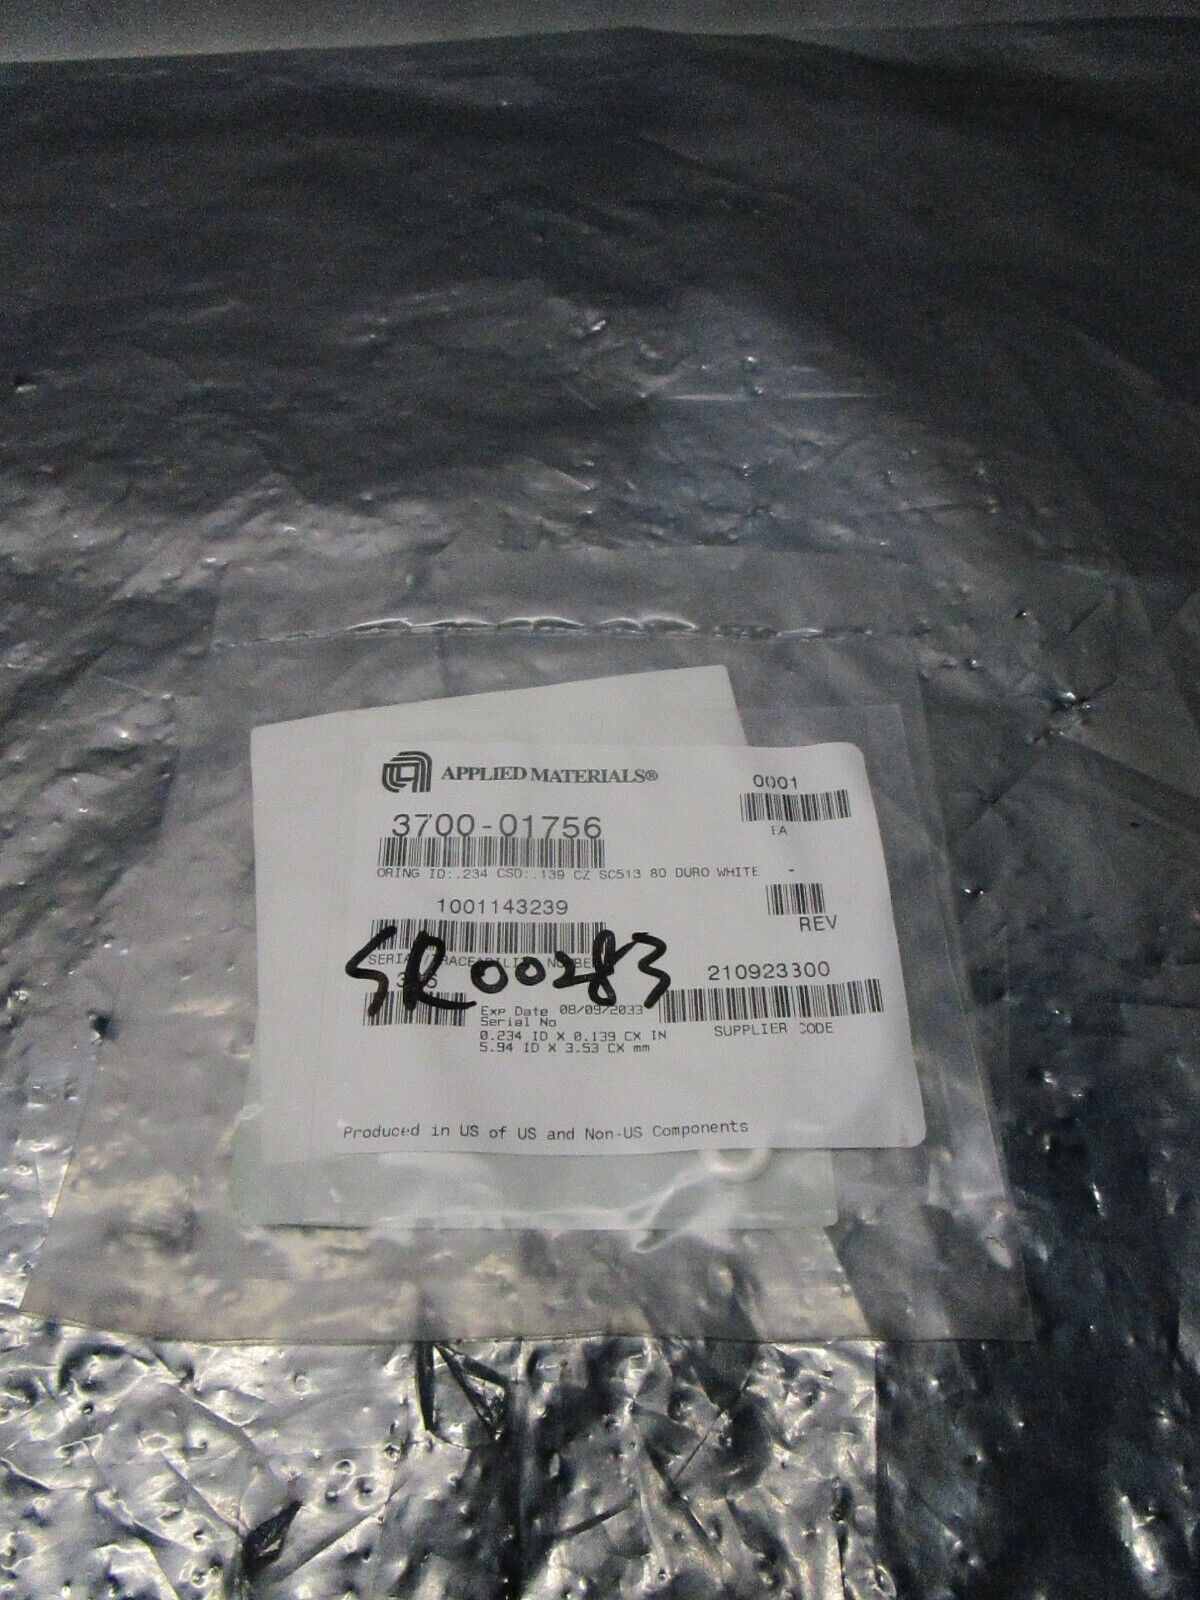 AMAT 3700-01756 Oring ID .234 CSD .139 CZ SC513 80 Duro White,TEL SR00283,101308